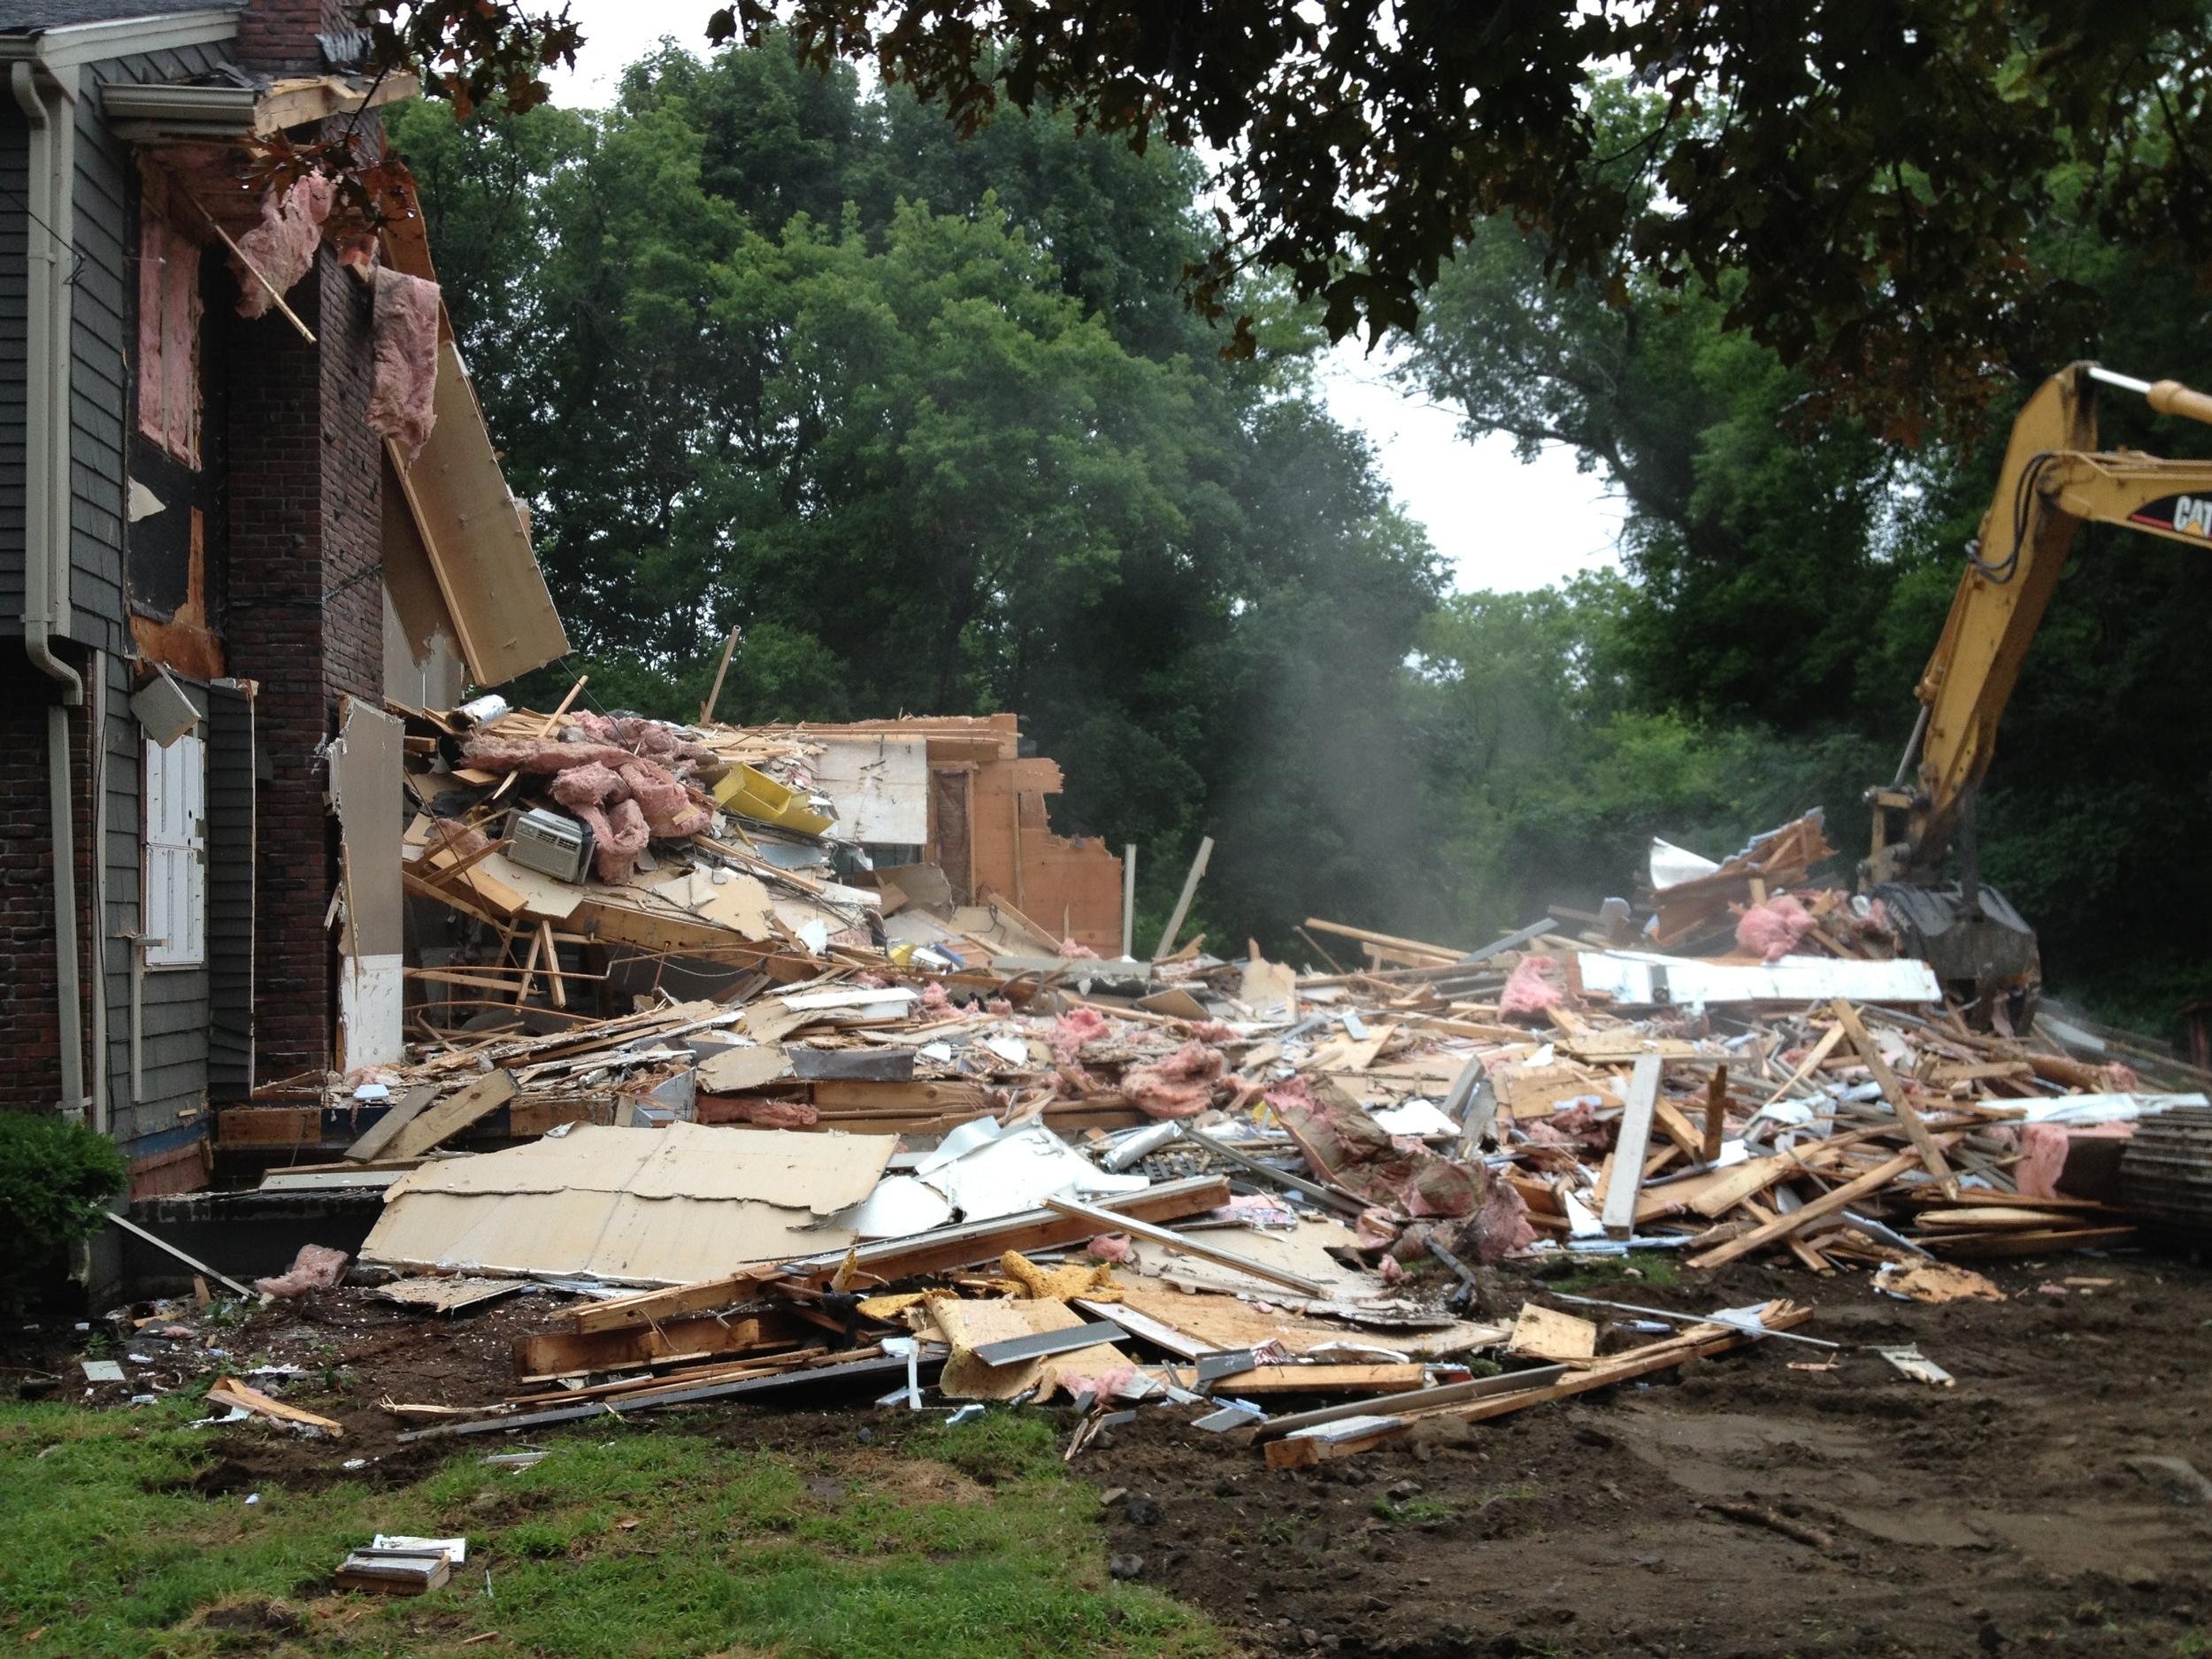 Winchester house demolition wellbuilt